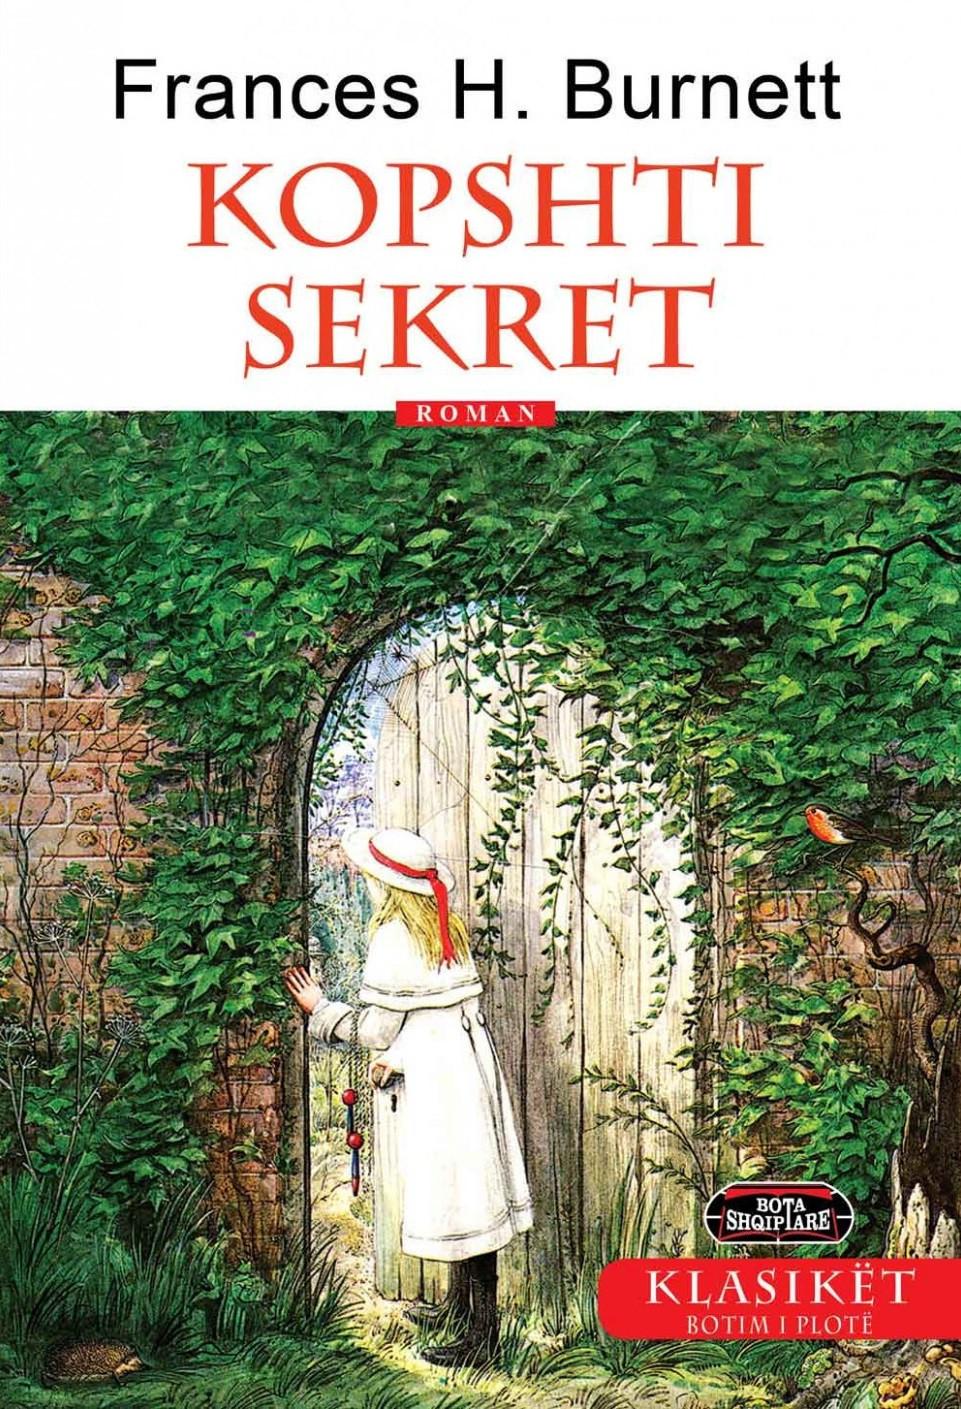 Kopshti sekret - BOT